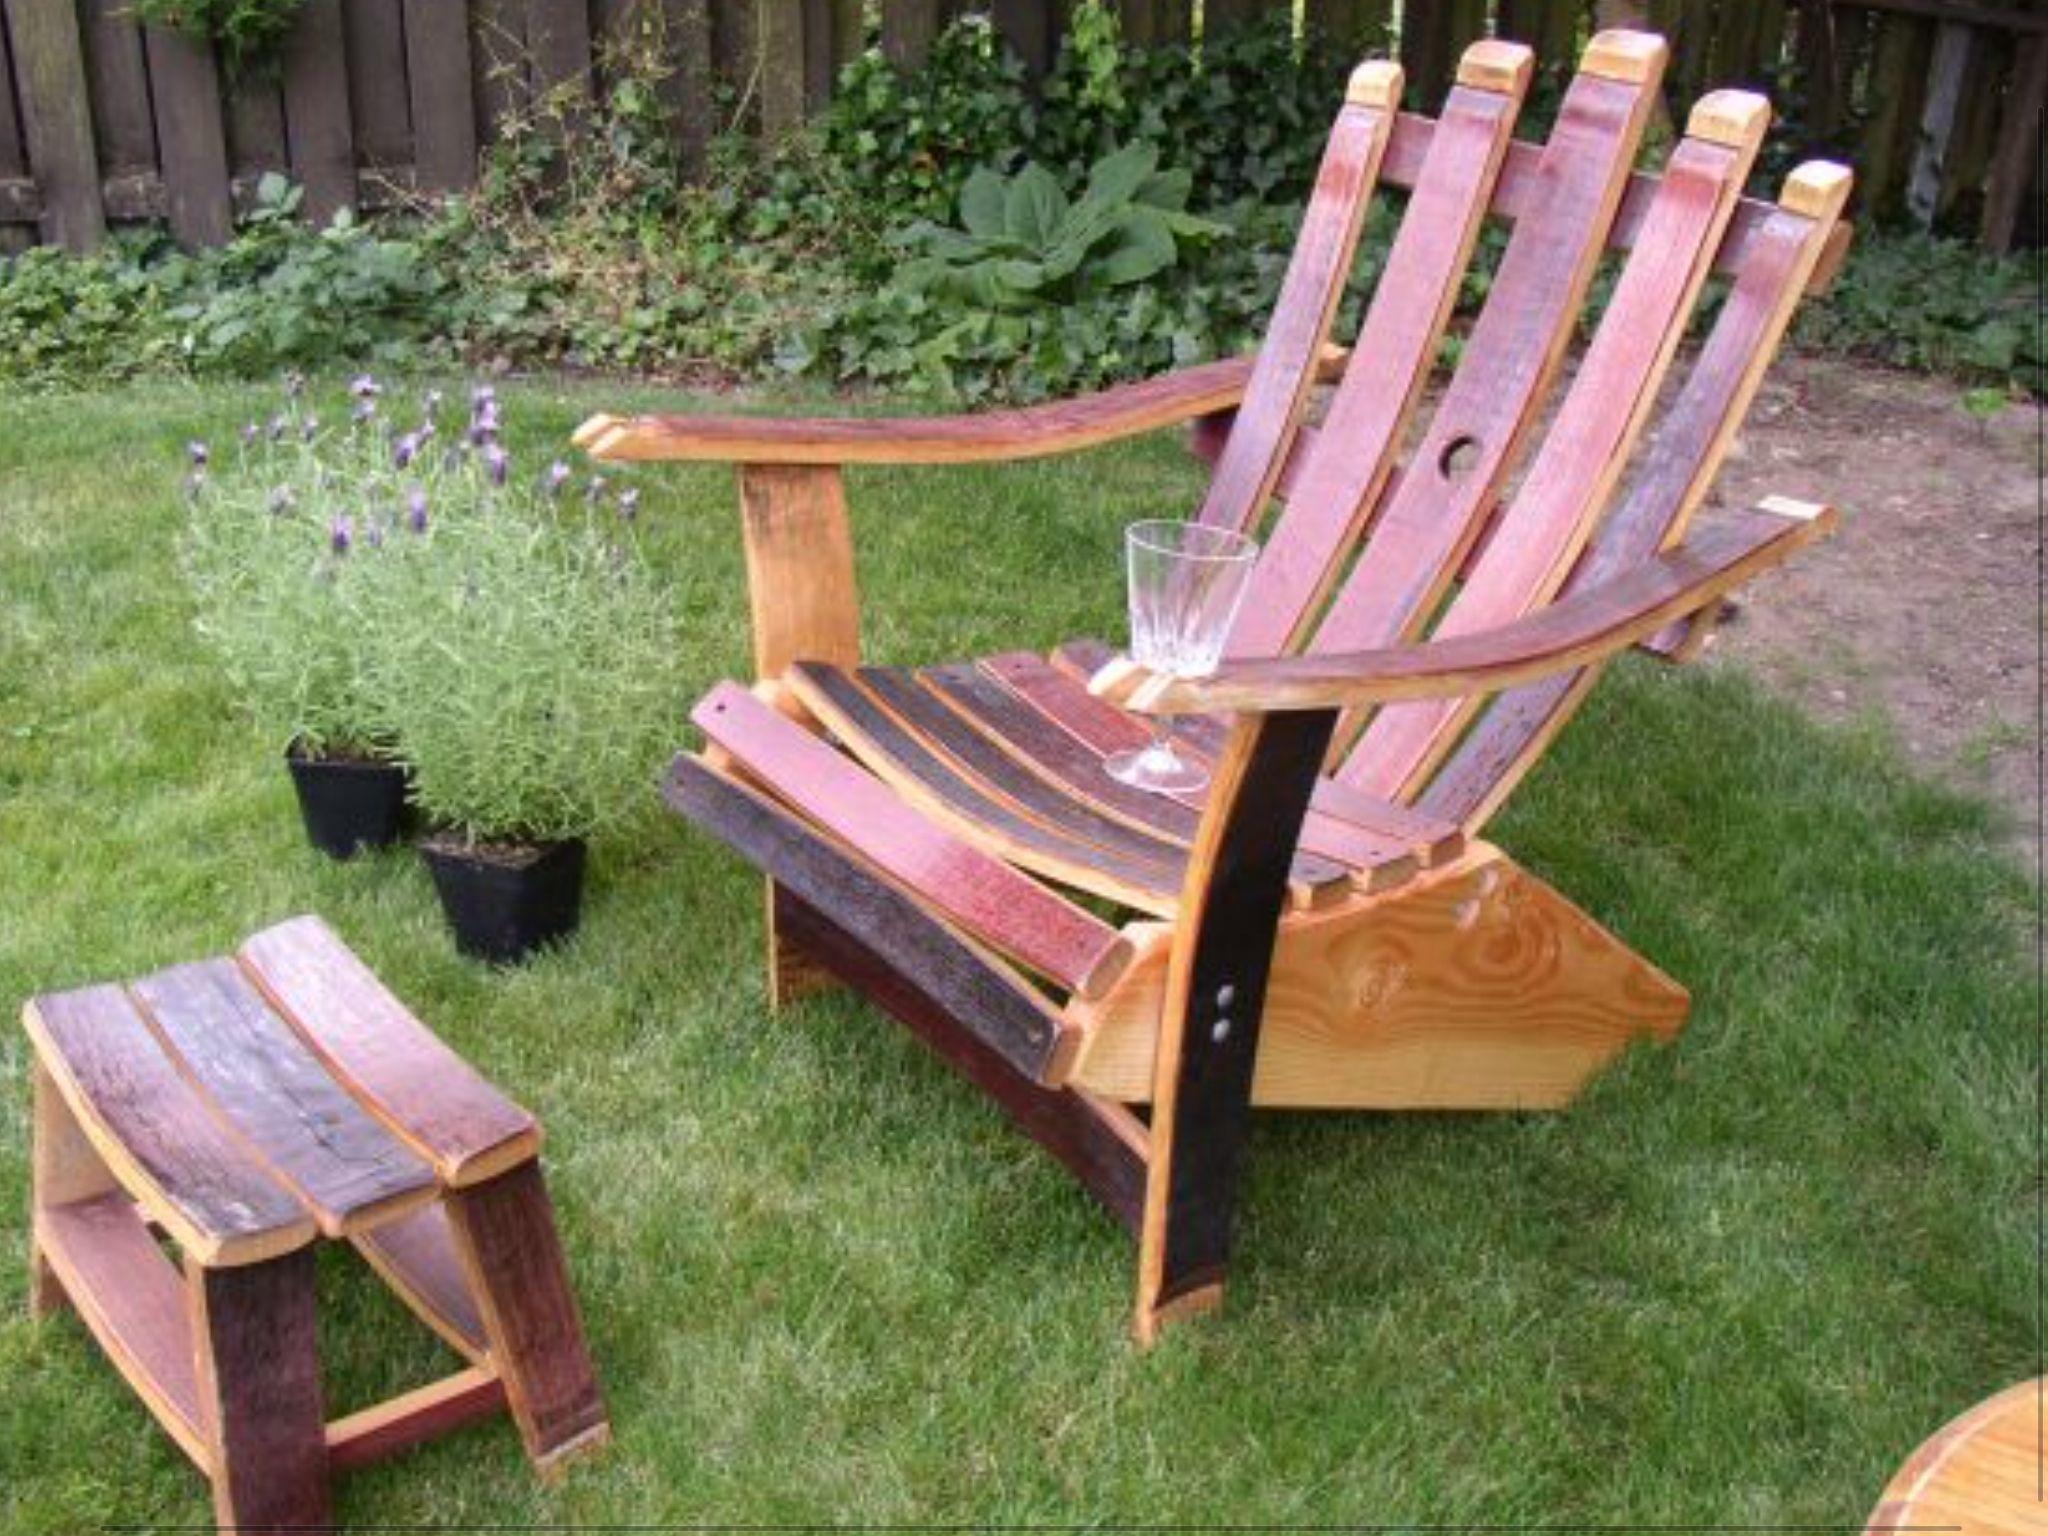 Fletchers Furniture Wine Barrel Adirondack Chair & Fletchers Furniture Wine Barrel Adirondack Chair | Outdoor Living ...